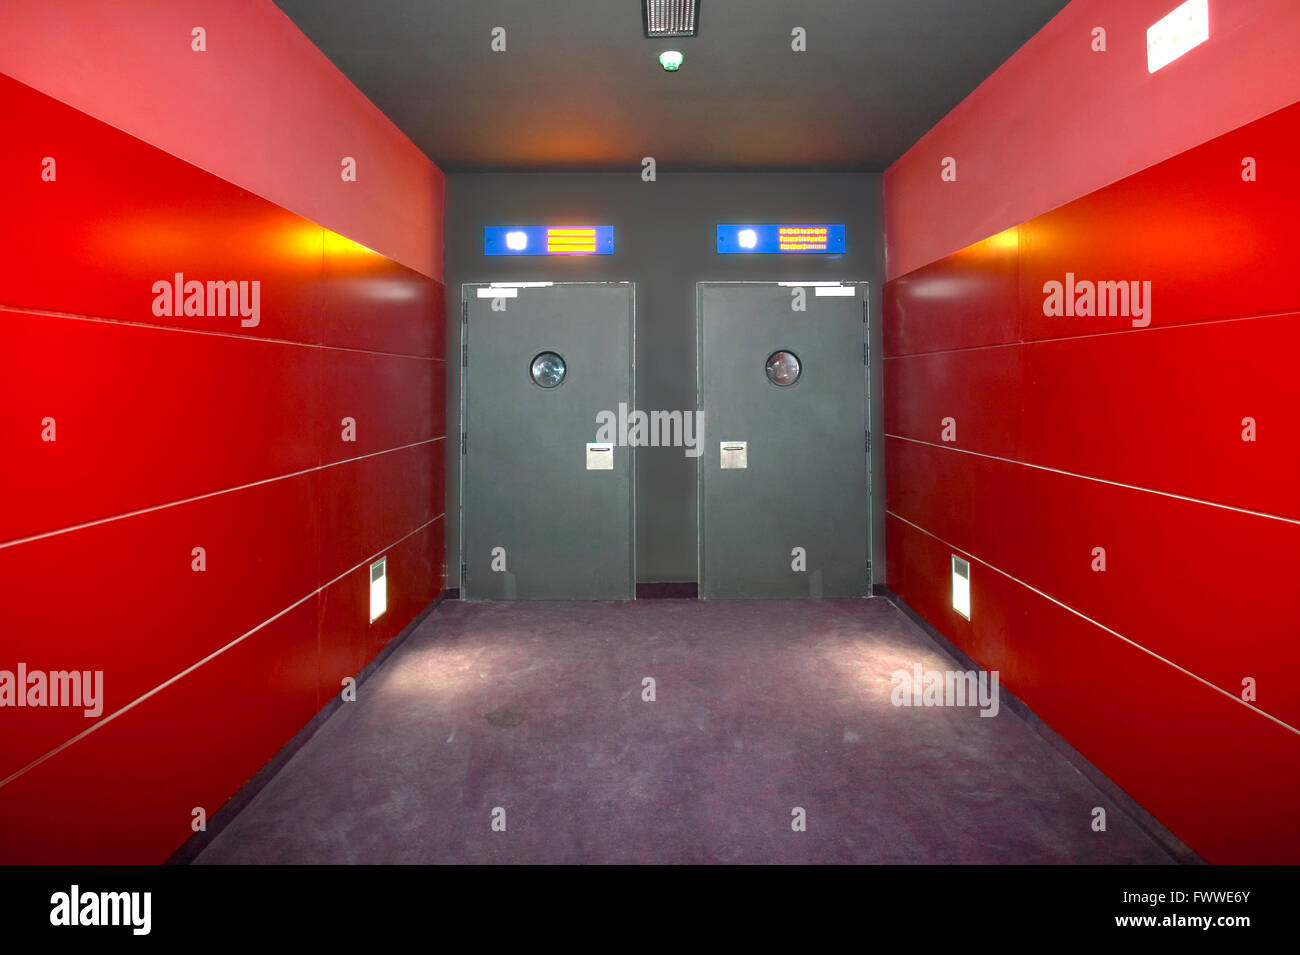 Two doors in a red corridor cinema room. Horizontal & Two doors in a red corridor cinema room. Horizontal Stock Photo ...